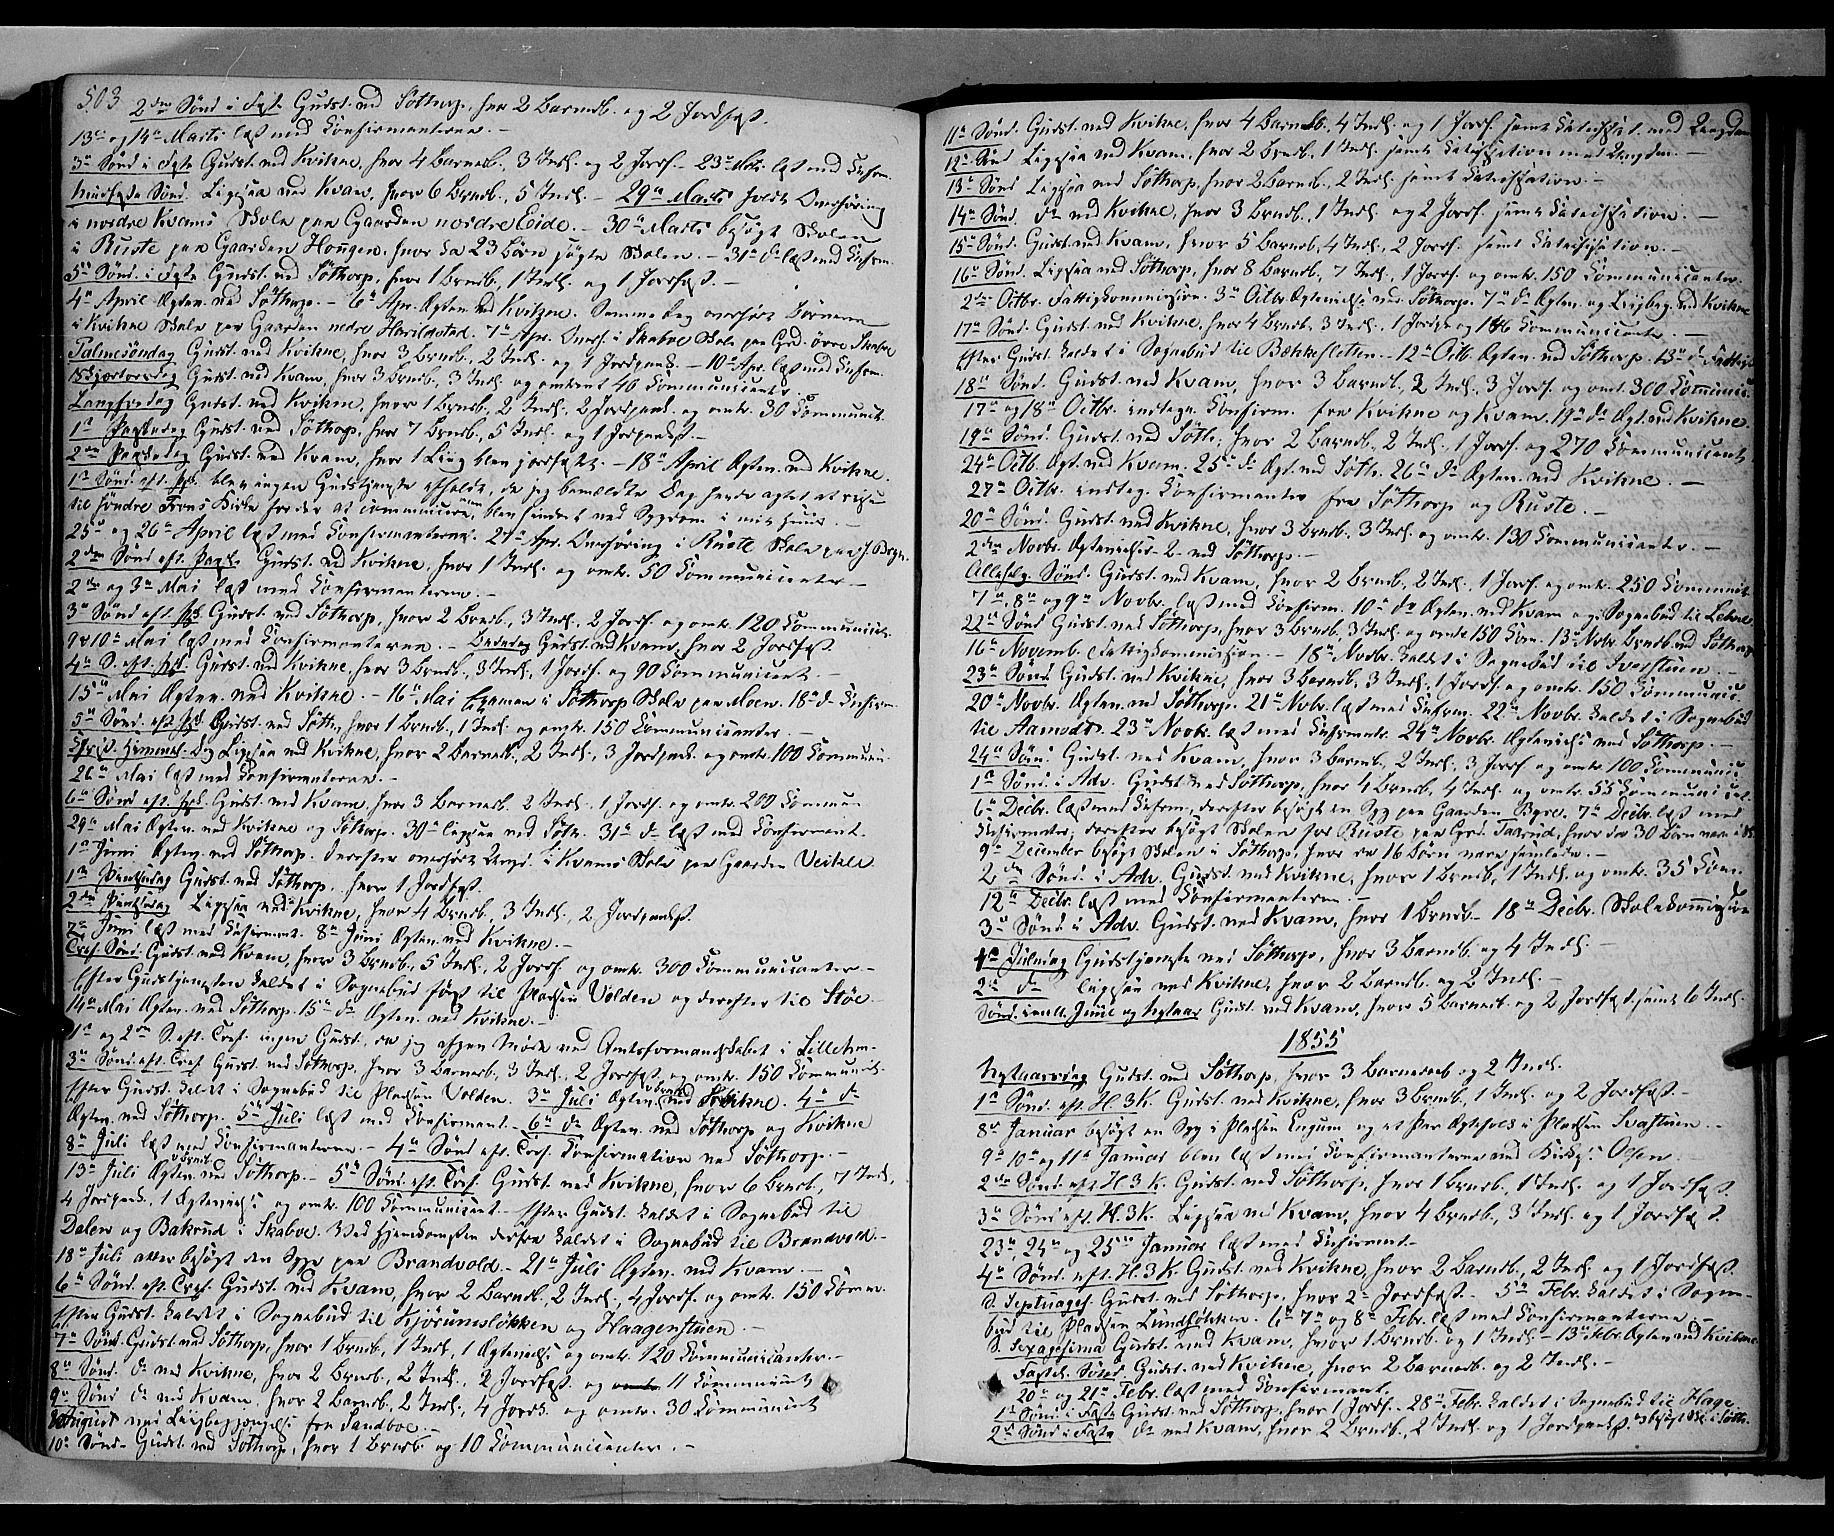 SAH, Nord-Fron prestekontor, Ministerialbok nr. 1, 1851-1864, s. 503